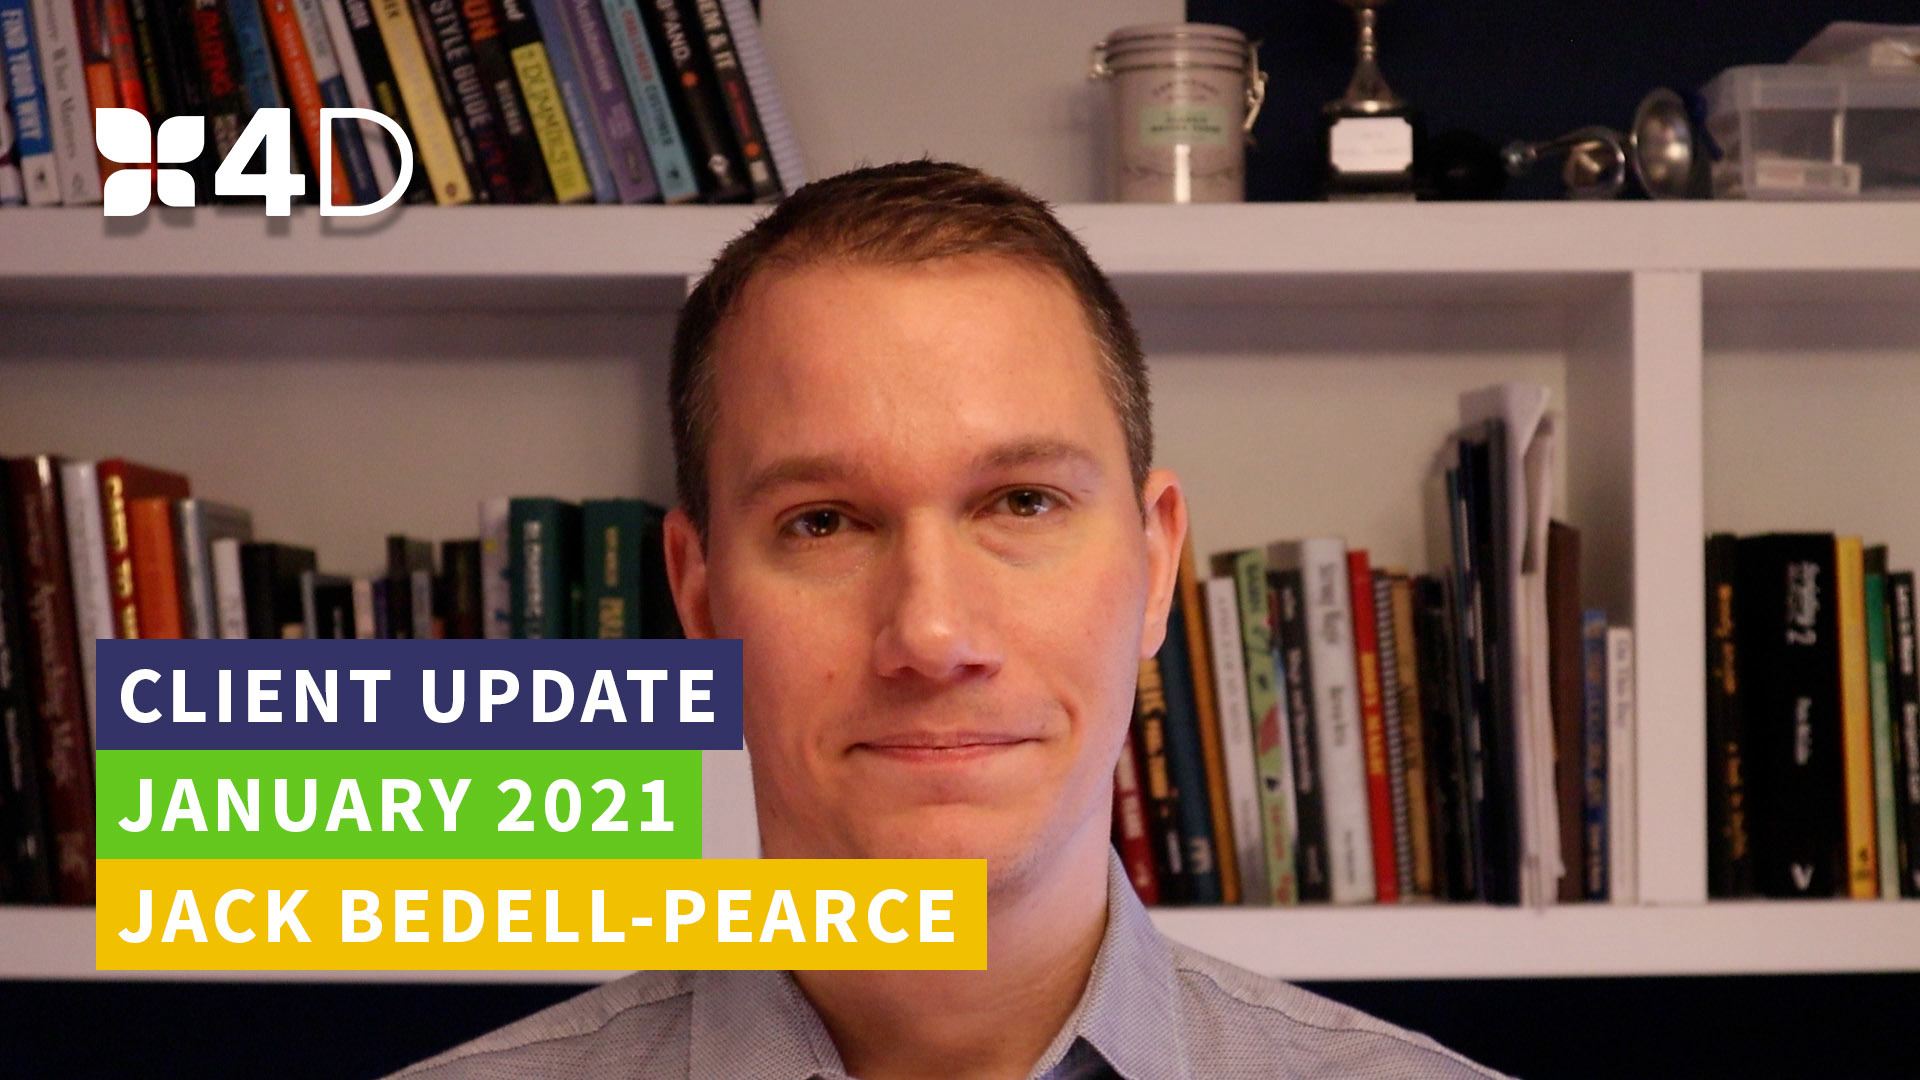 4D - Client Update - Jan 2021